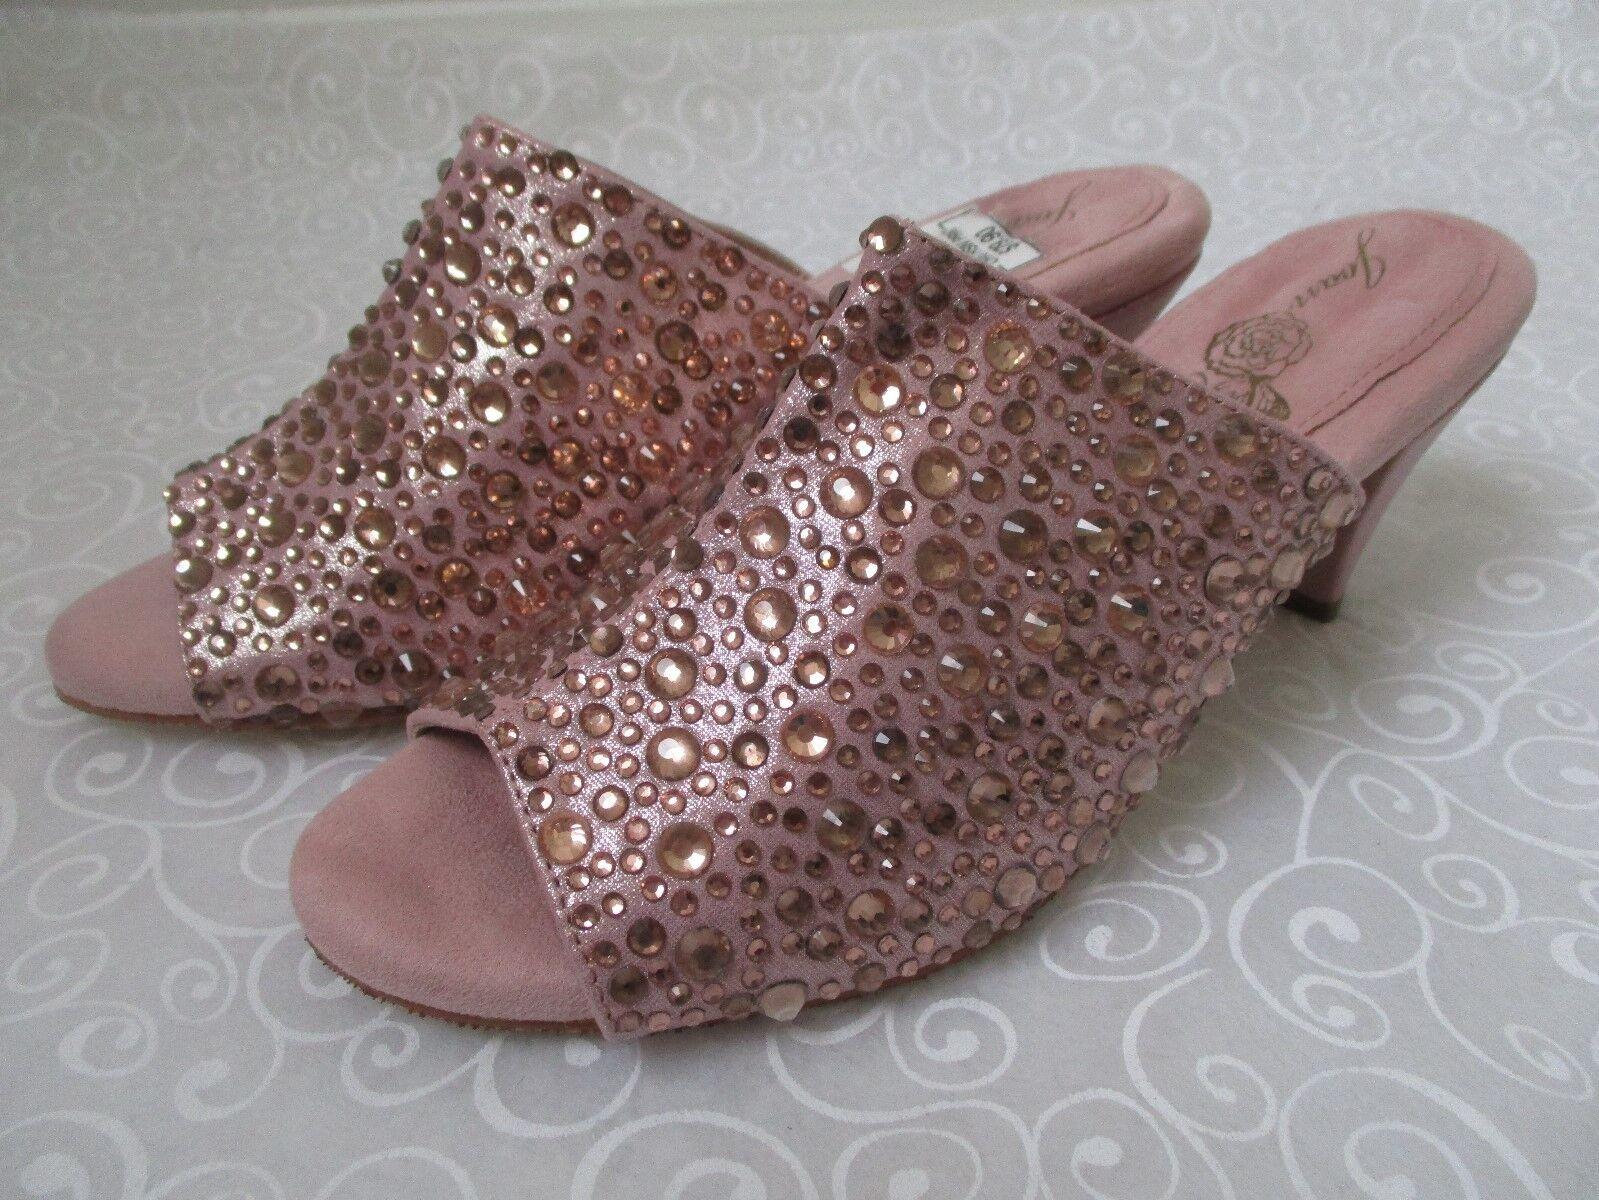 JOAN BOYCE ENCRUSTE ROSE GOLD RHINESTONE OPE TOE Schuhe SIZE 9 1/2 W - NEU